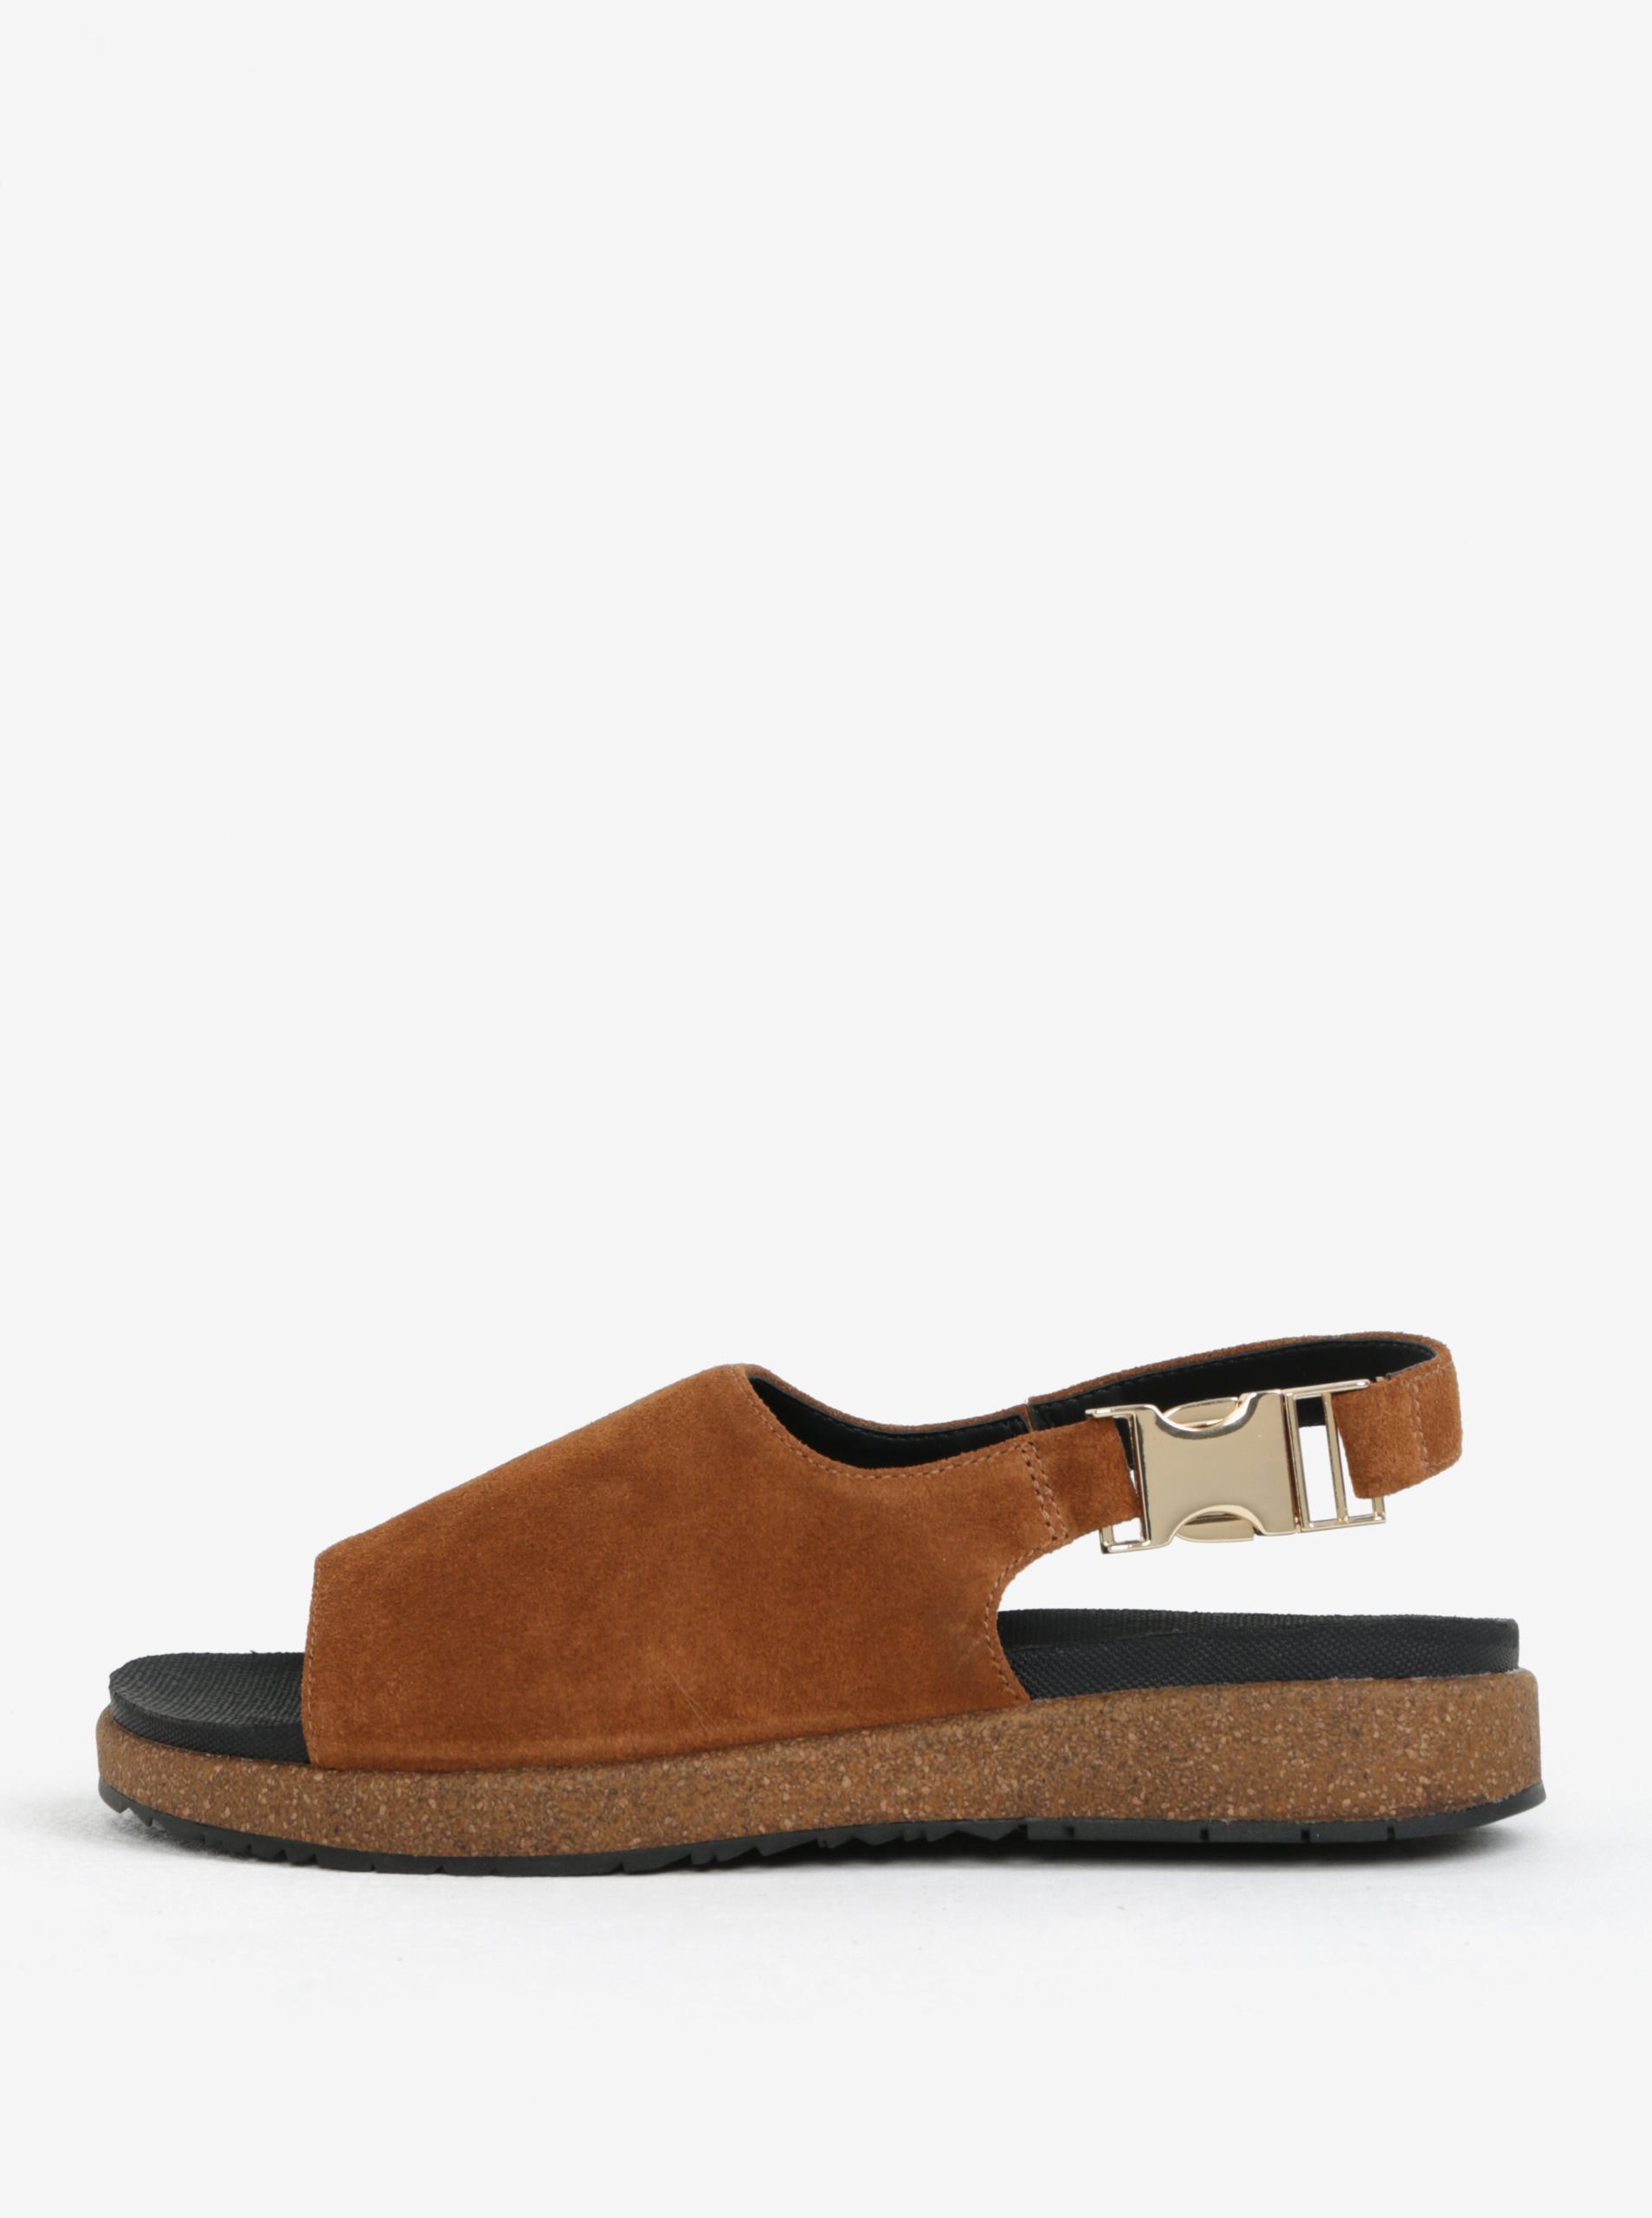 6081c6472ad1 Hnedé dámske semišové sandále Woden Stella